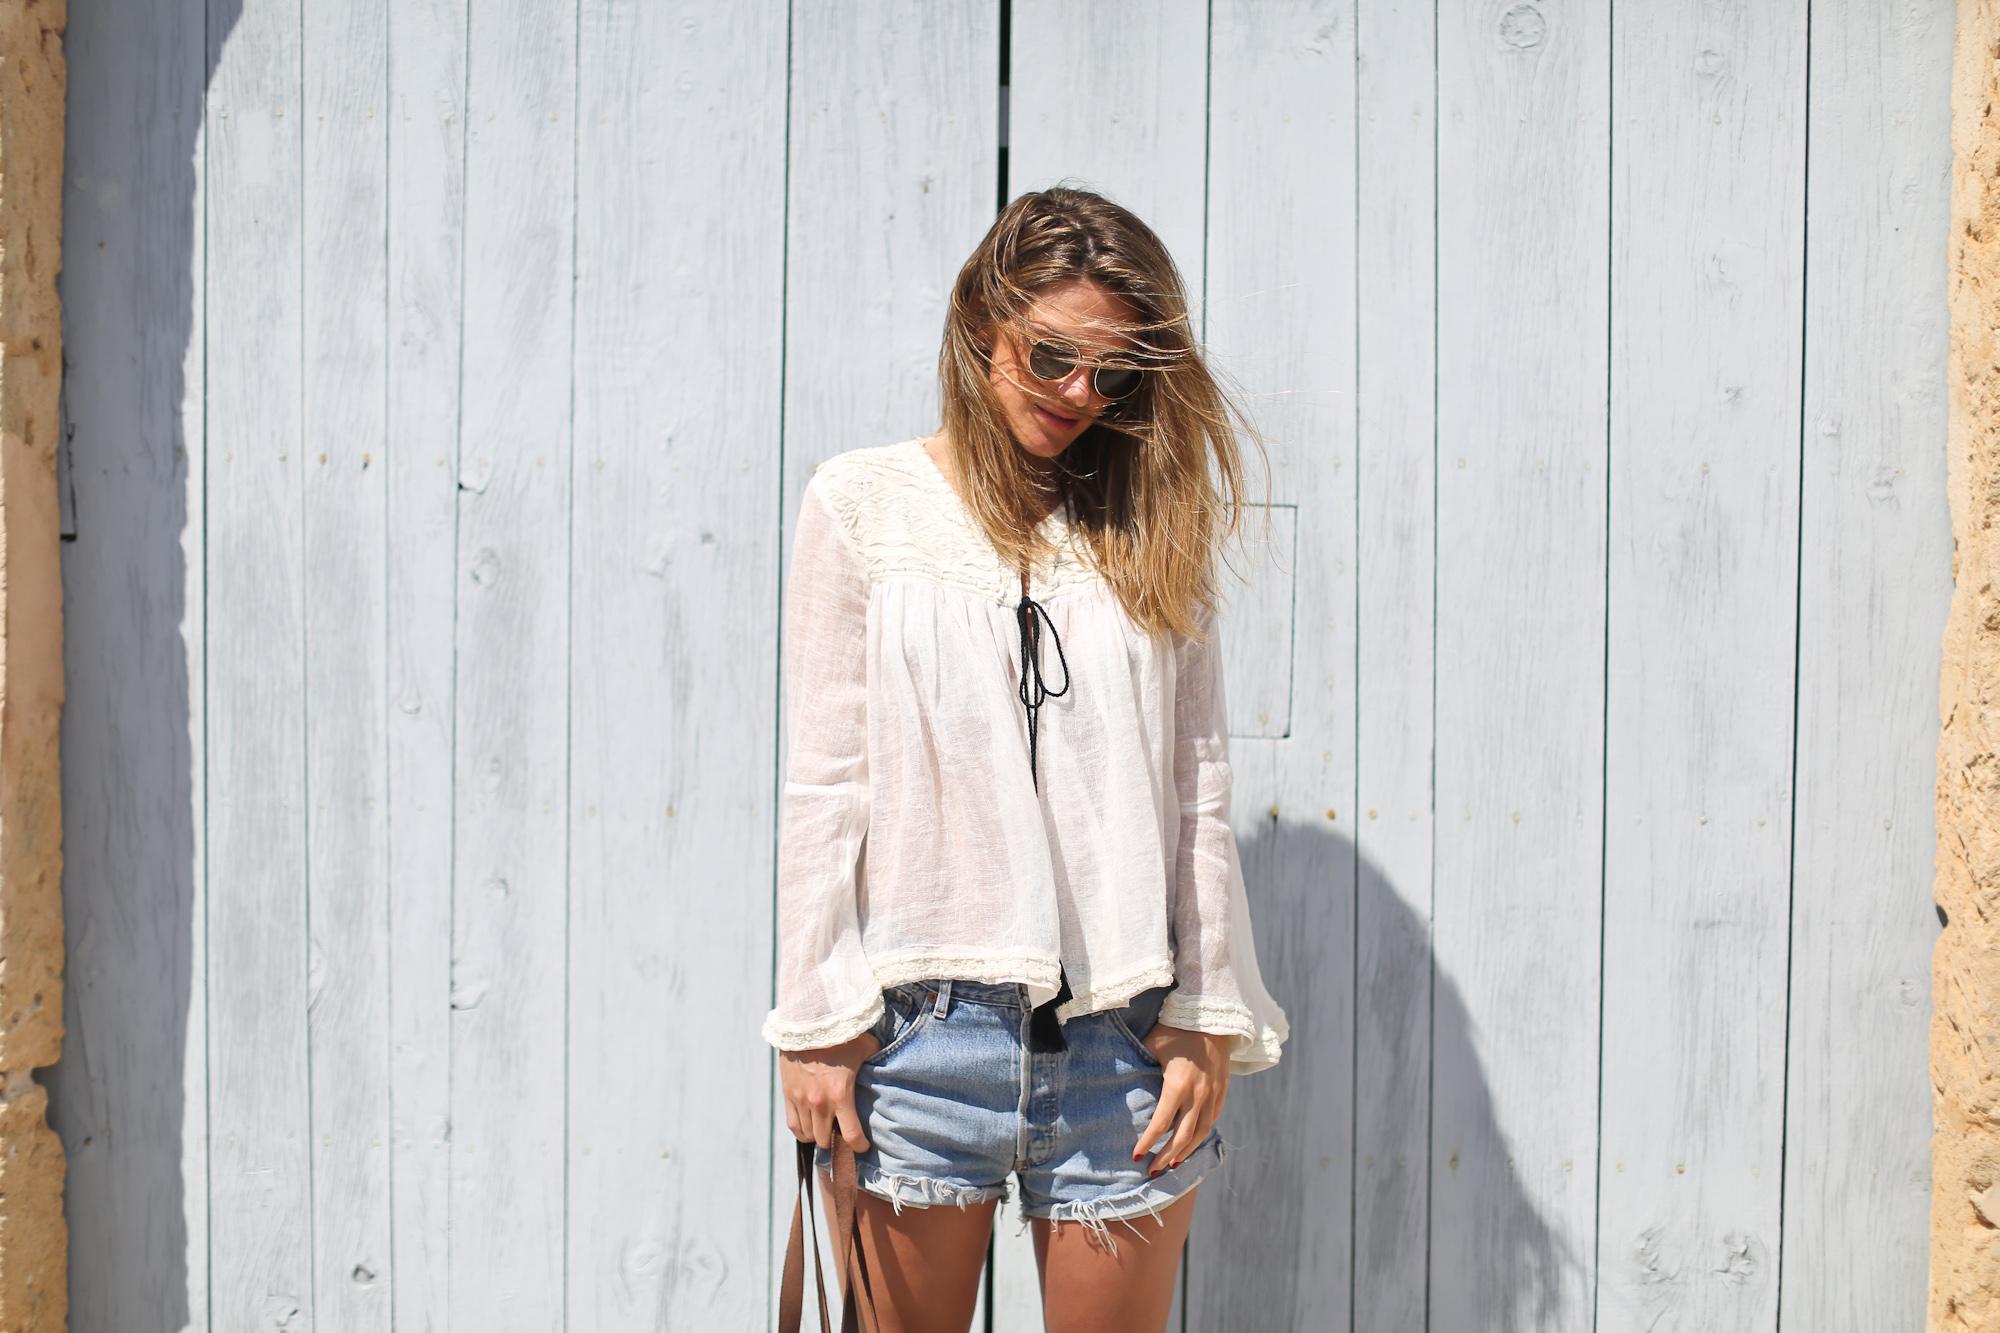 Clochet_streetstyle_zara_embroided_linen_kimonojacket_vintagelevis501shorts-3